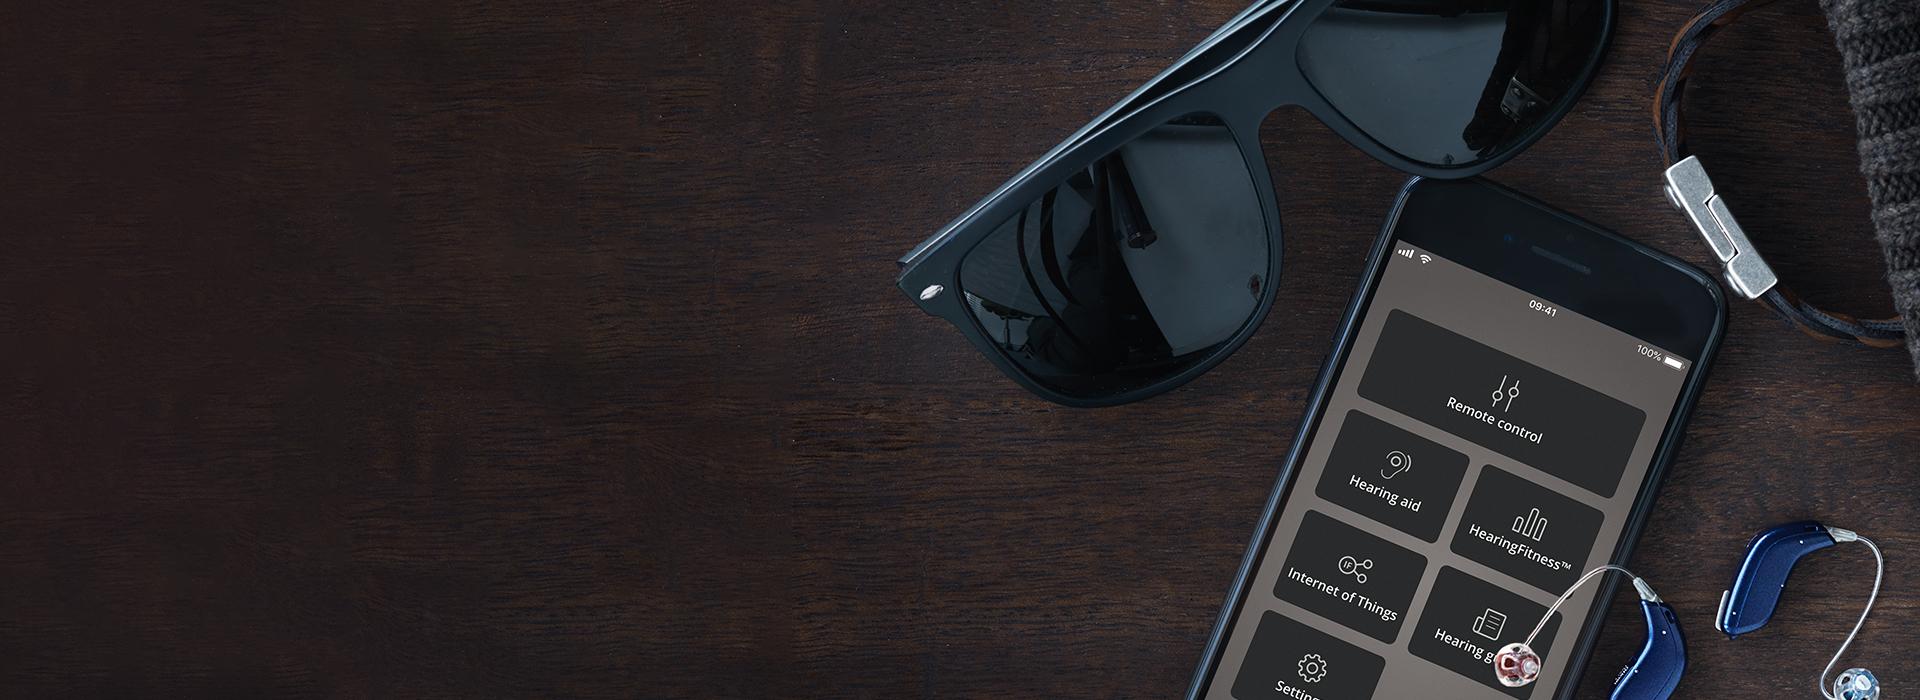 iphone re-pairing